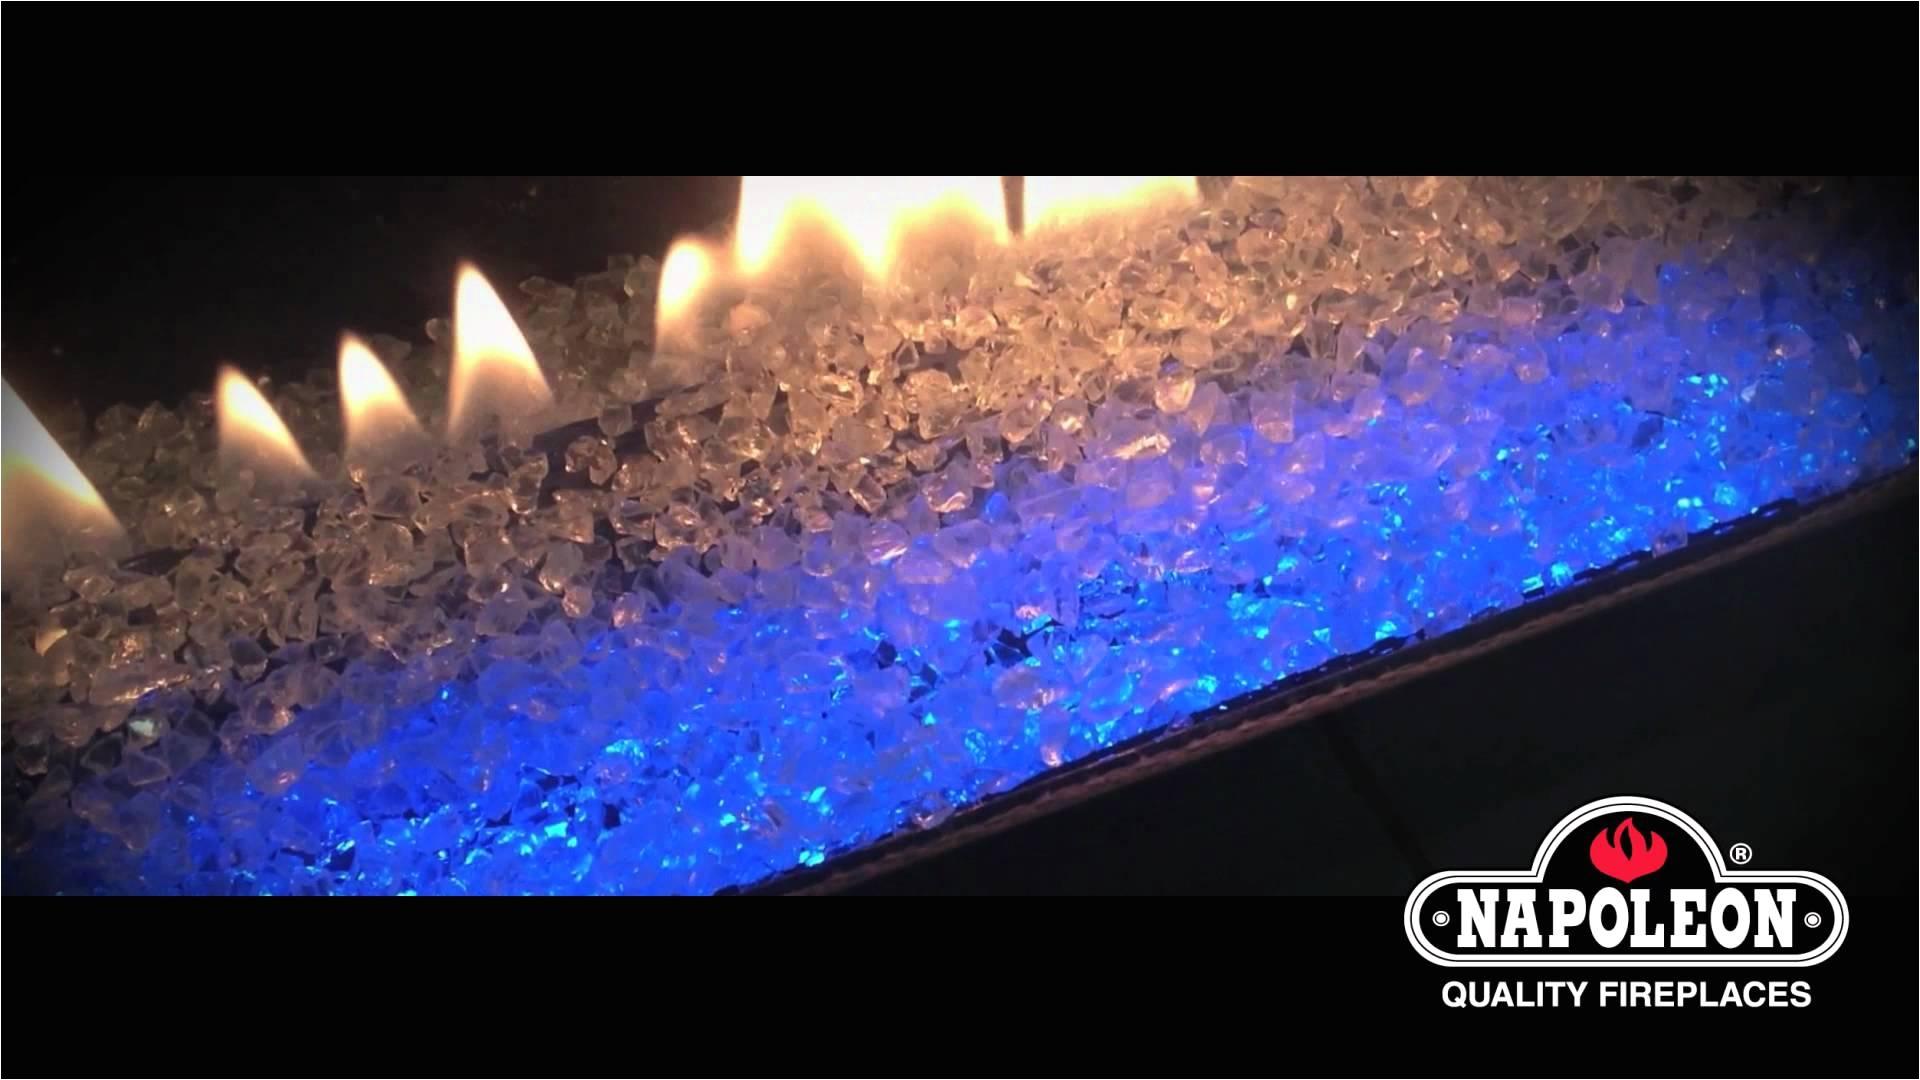 napoleon fireplaces led light transitioning effects